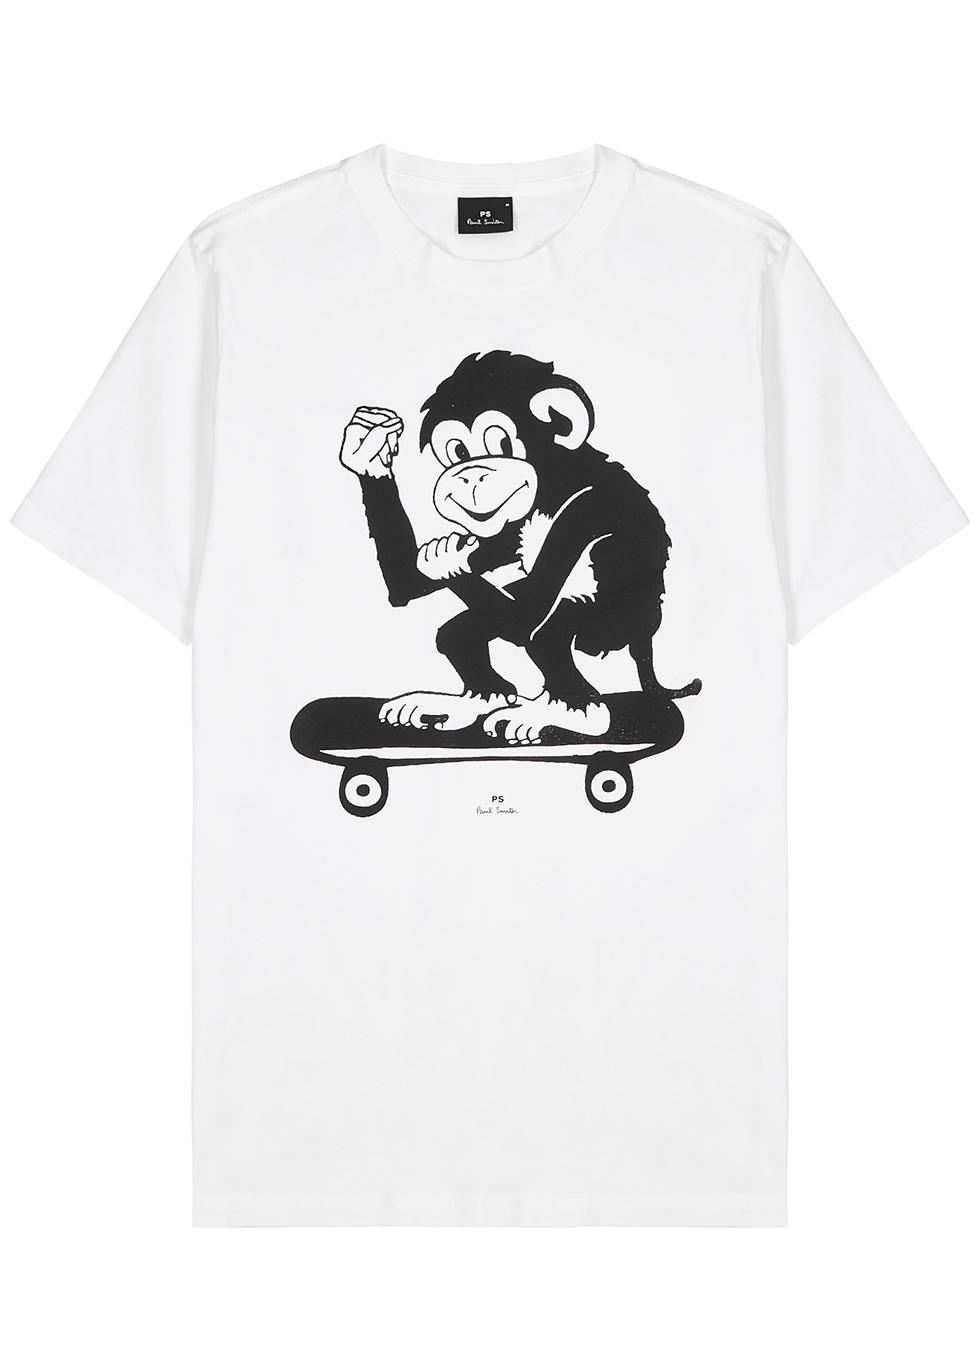 White printed cotton T-shirt